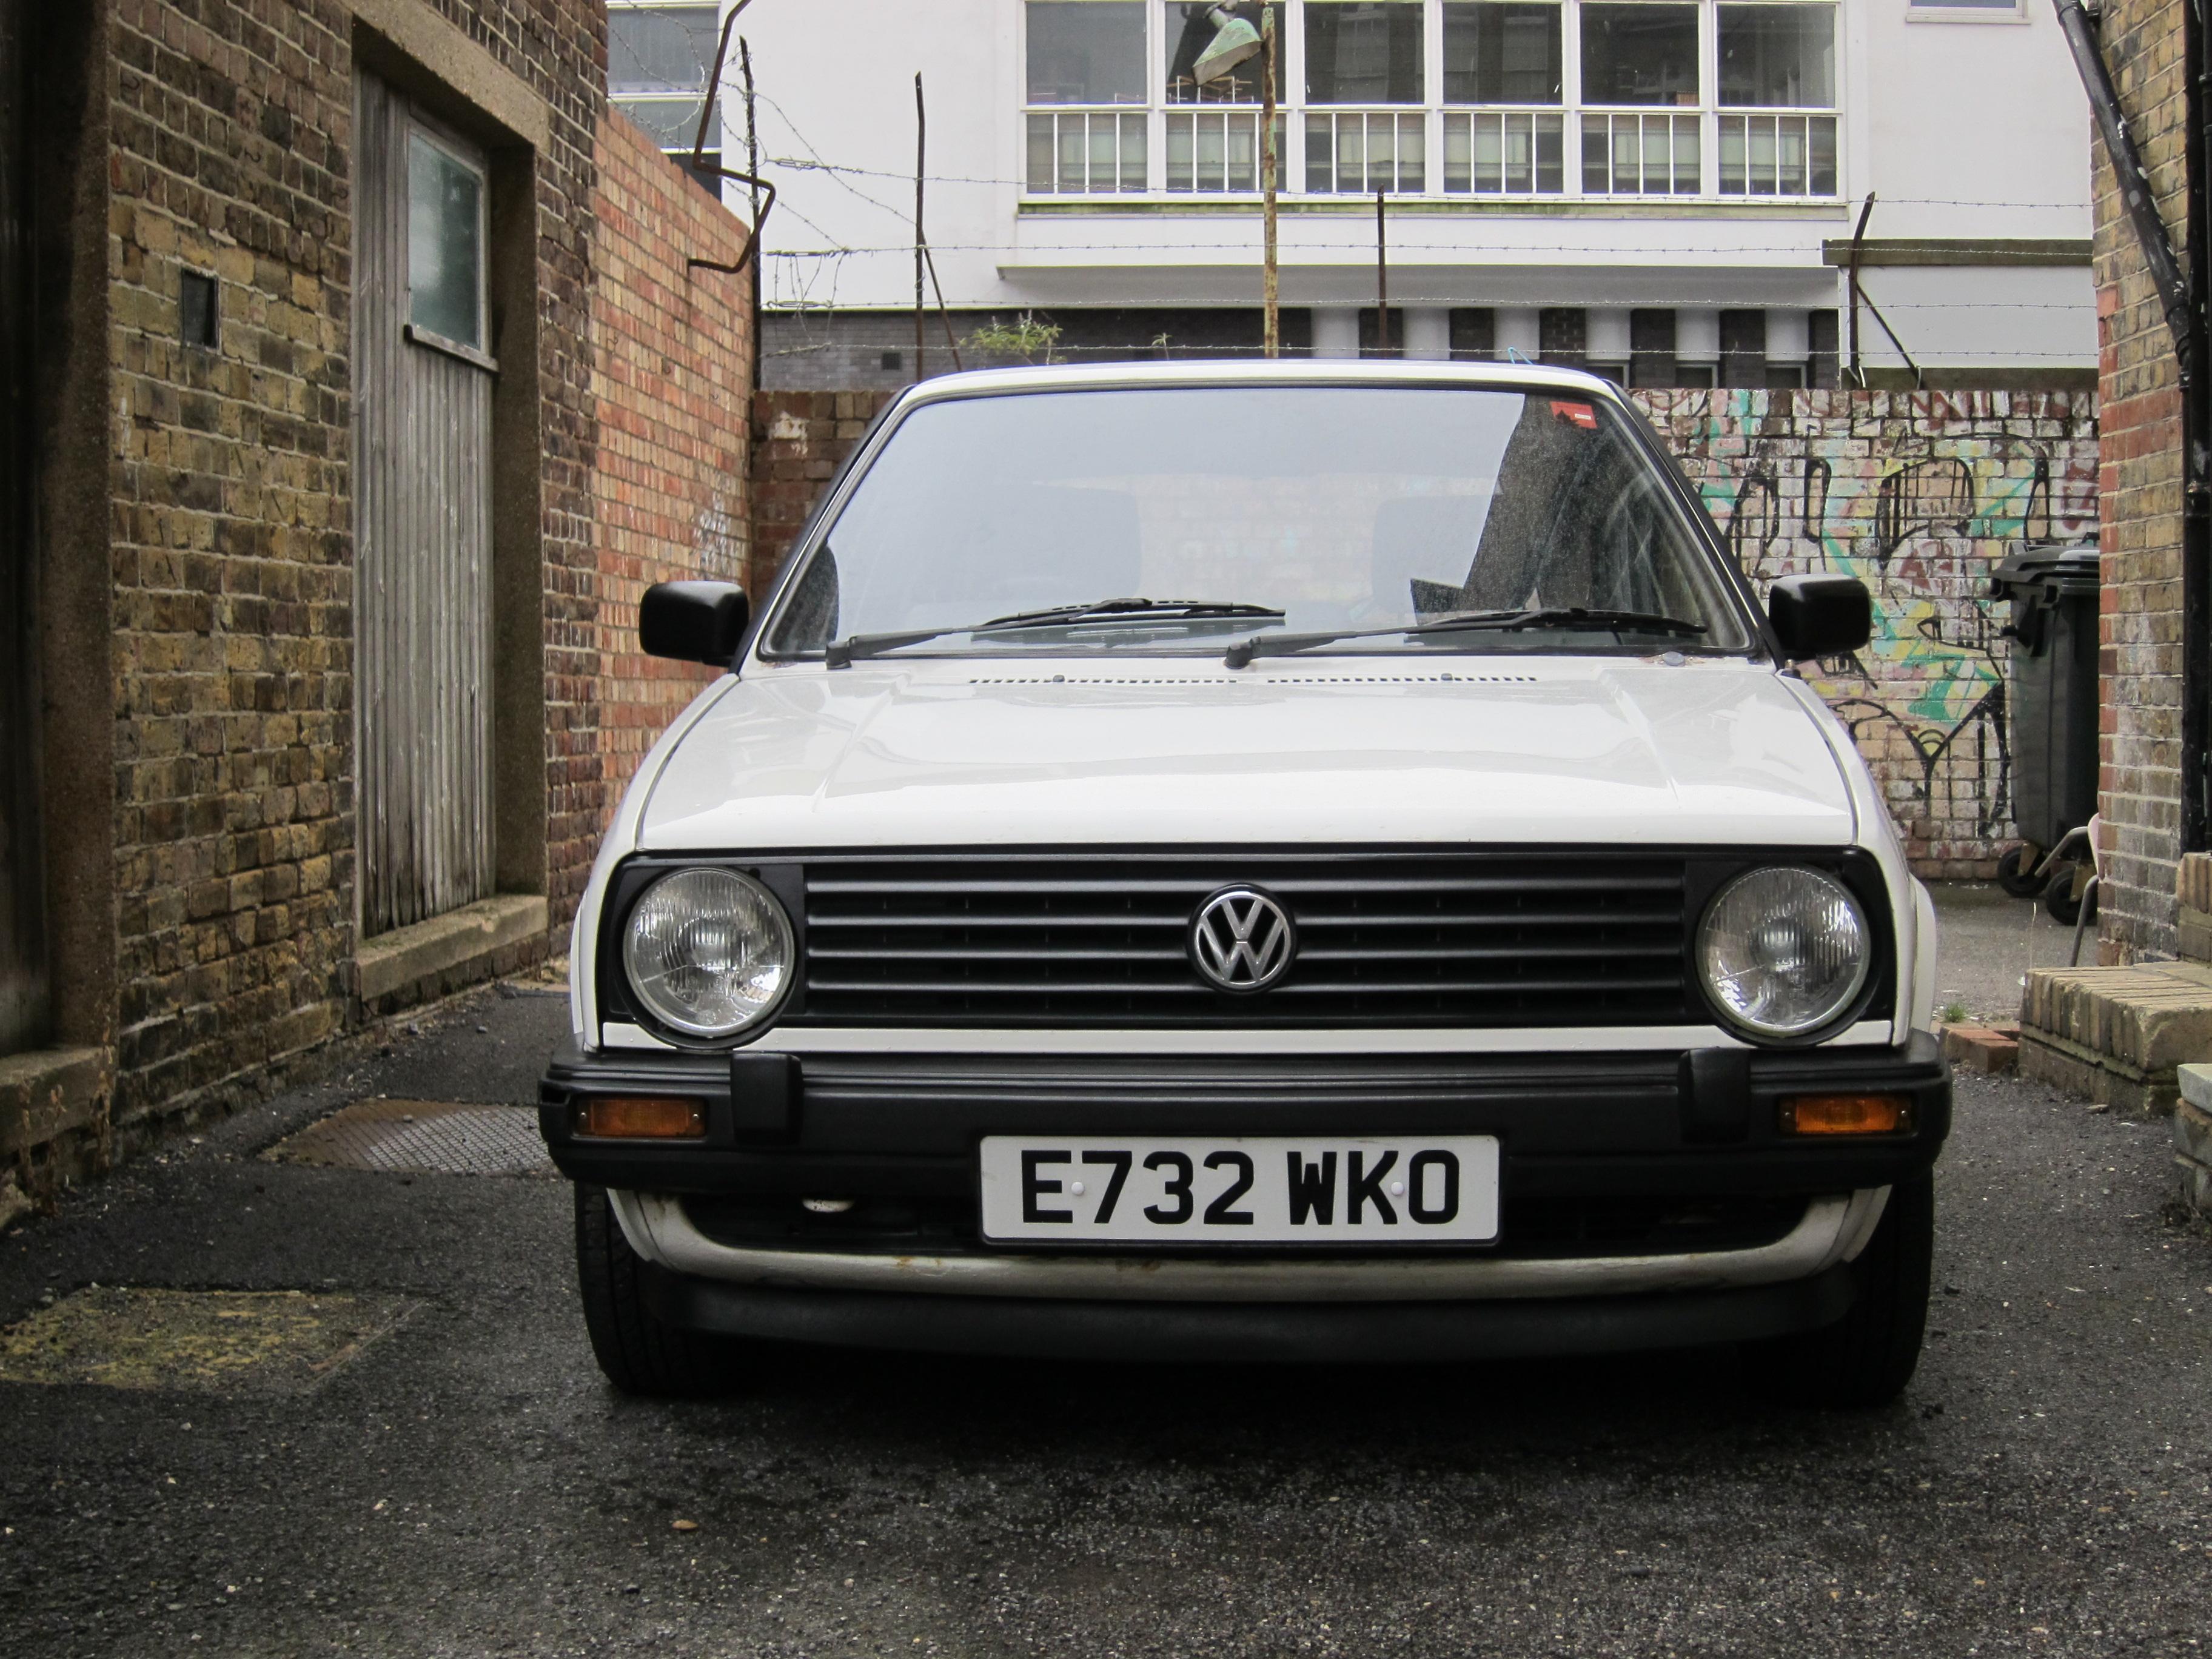 1987/8 Golf 1.6 CL | VW Golf Mk2 OC - Cars For Sale